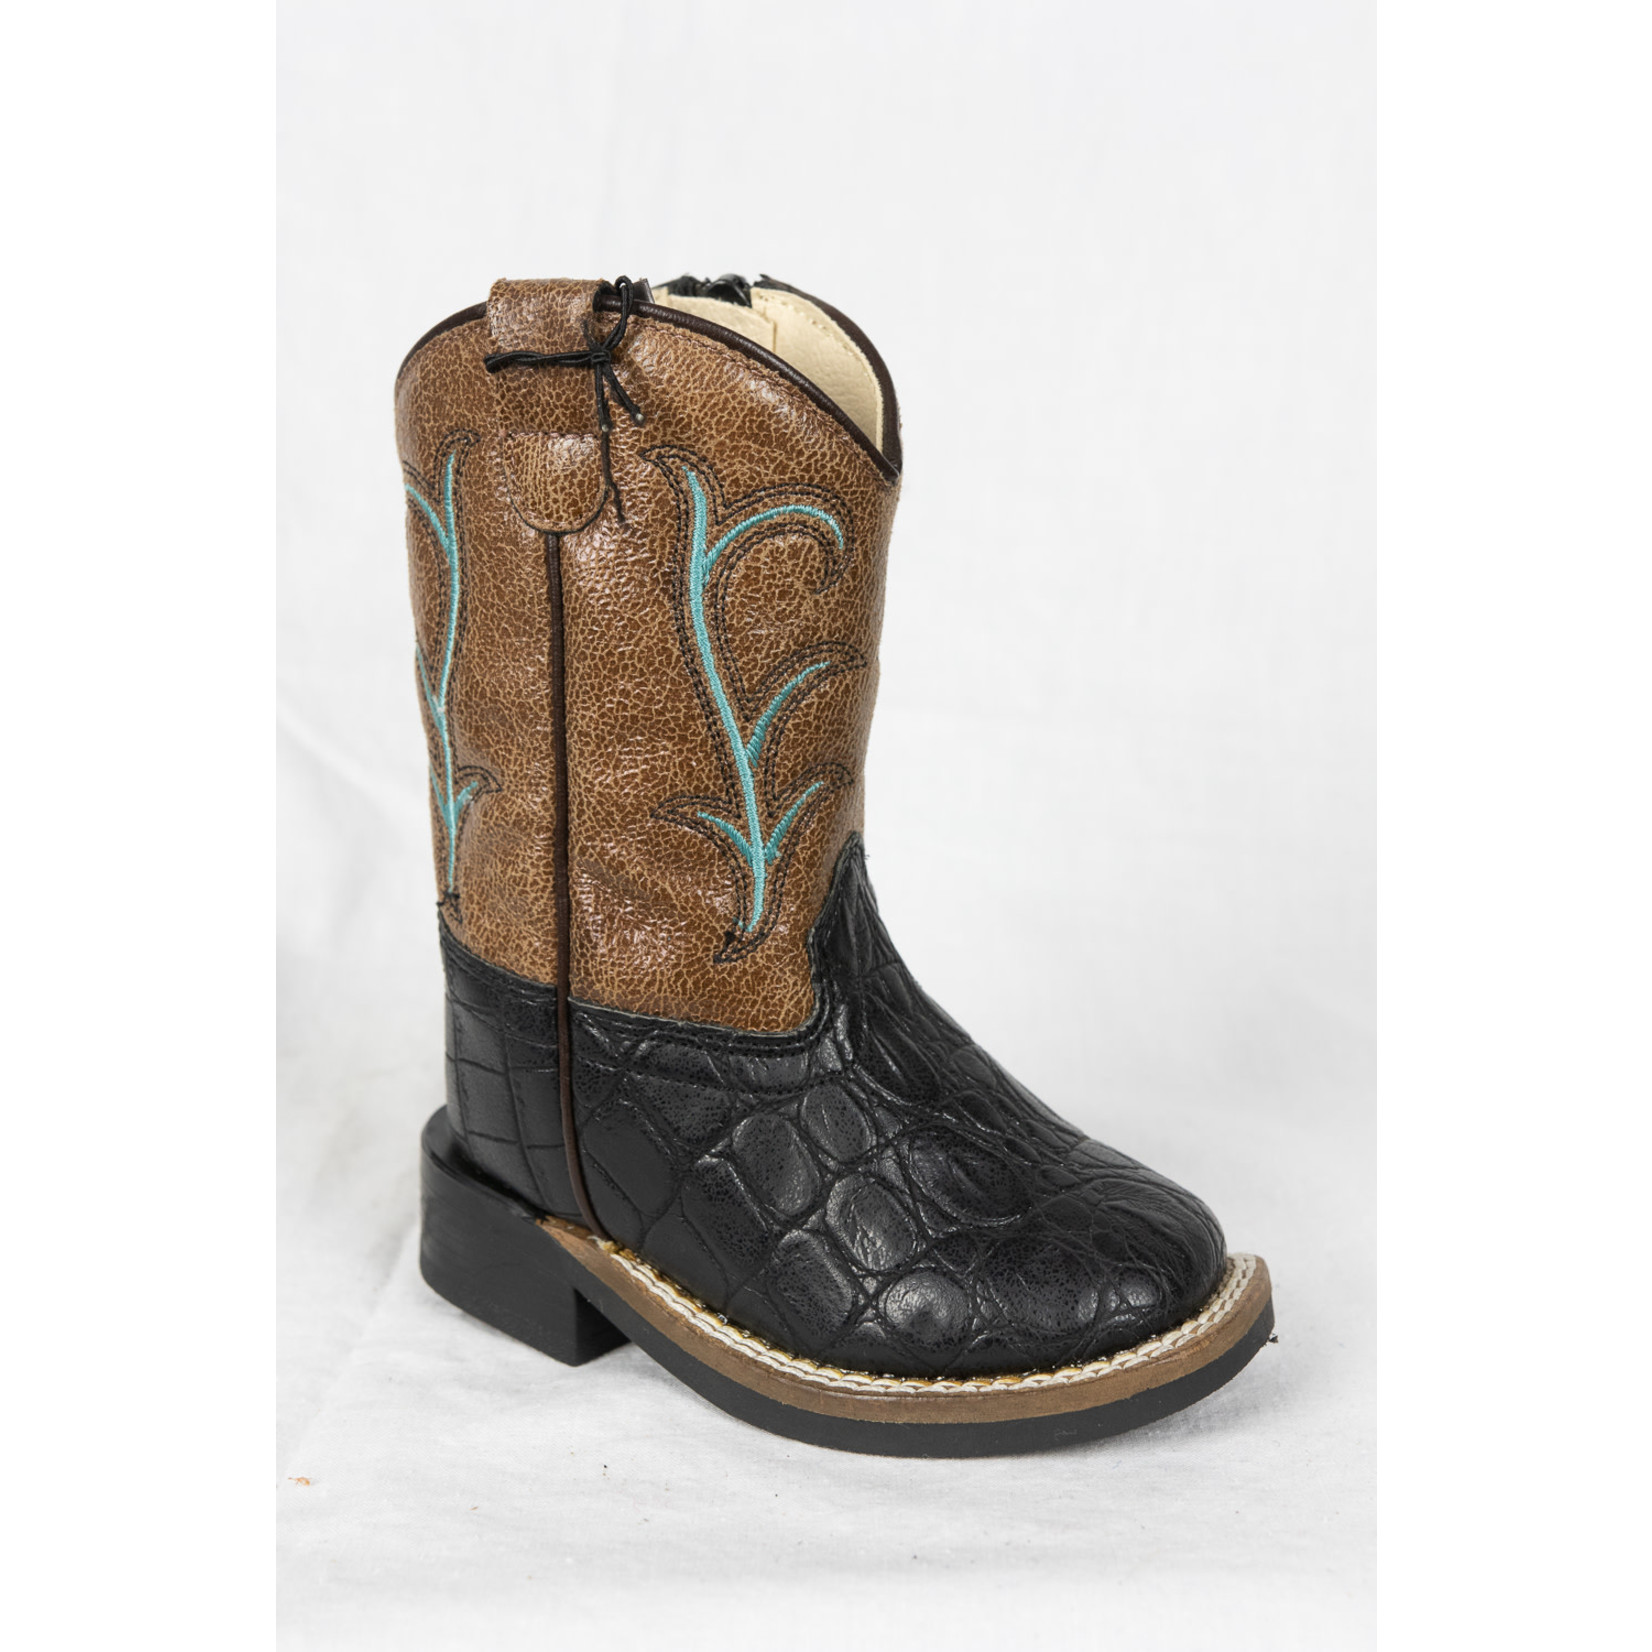 Old west Old West Brown Black Zip Children Cowboy Boot VB1012